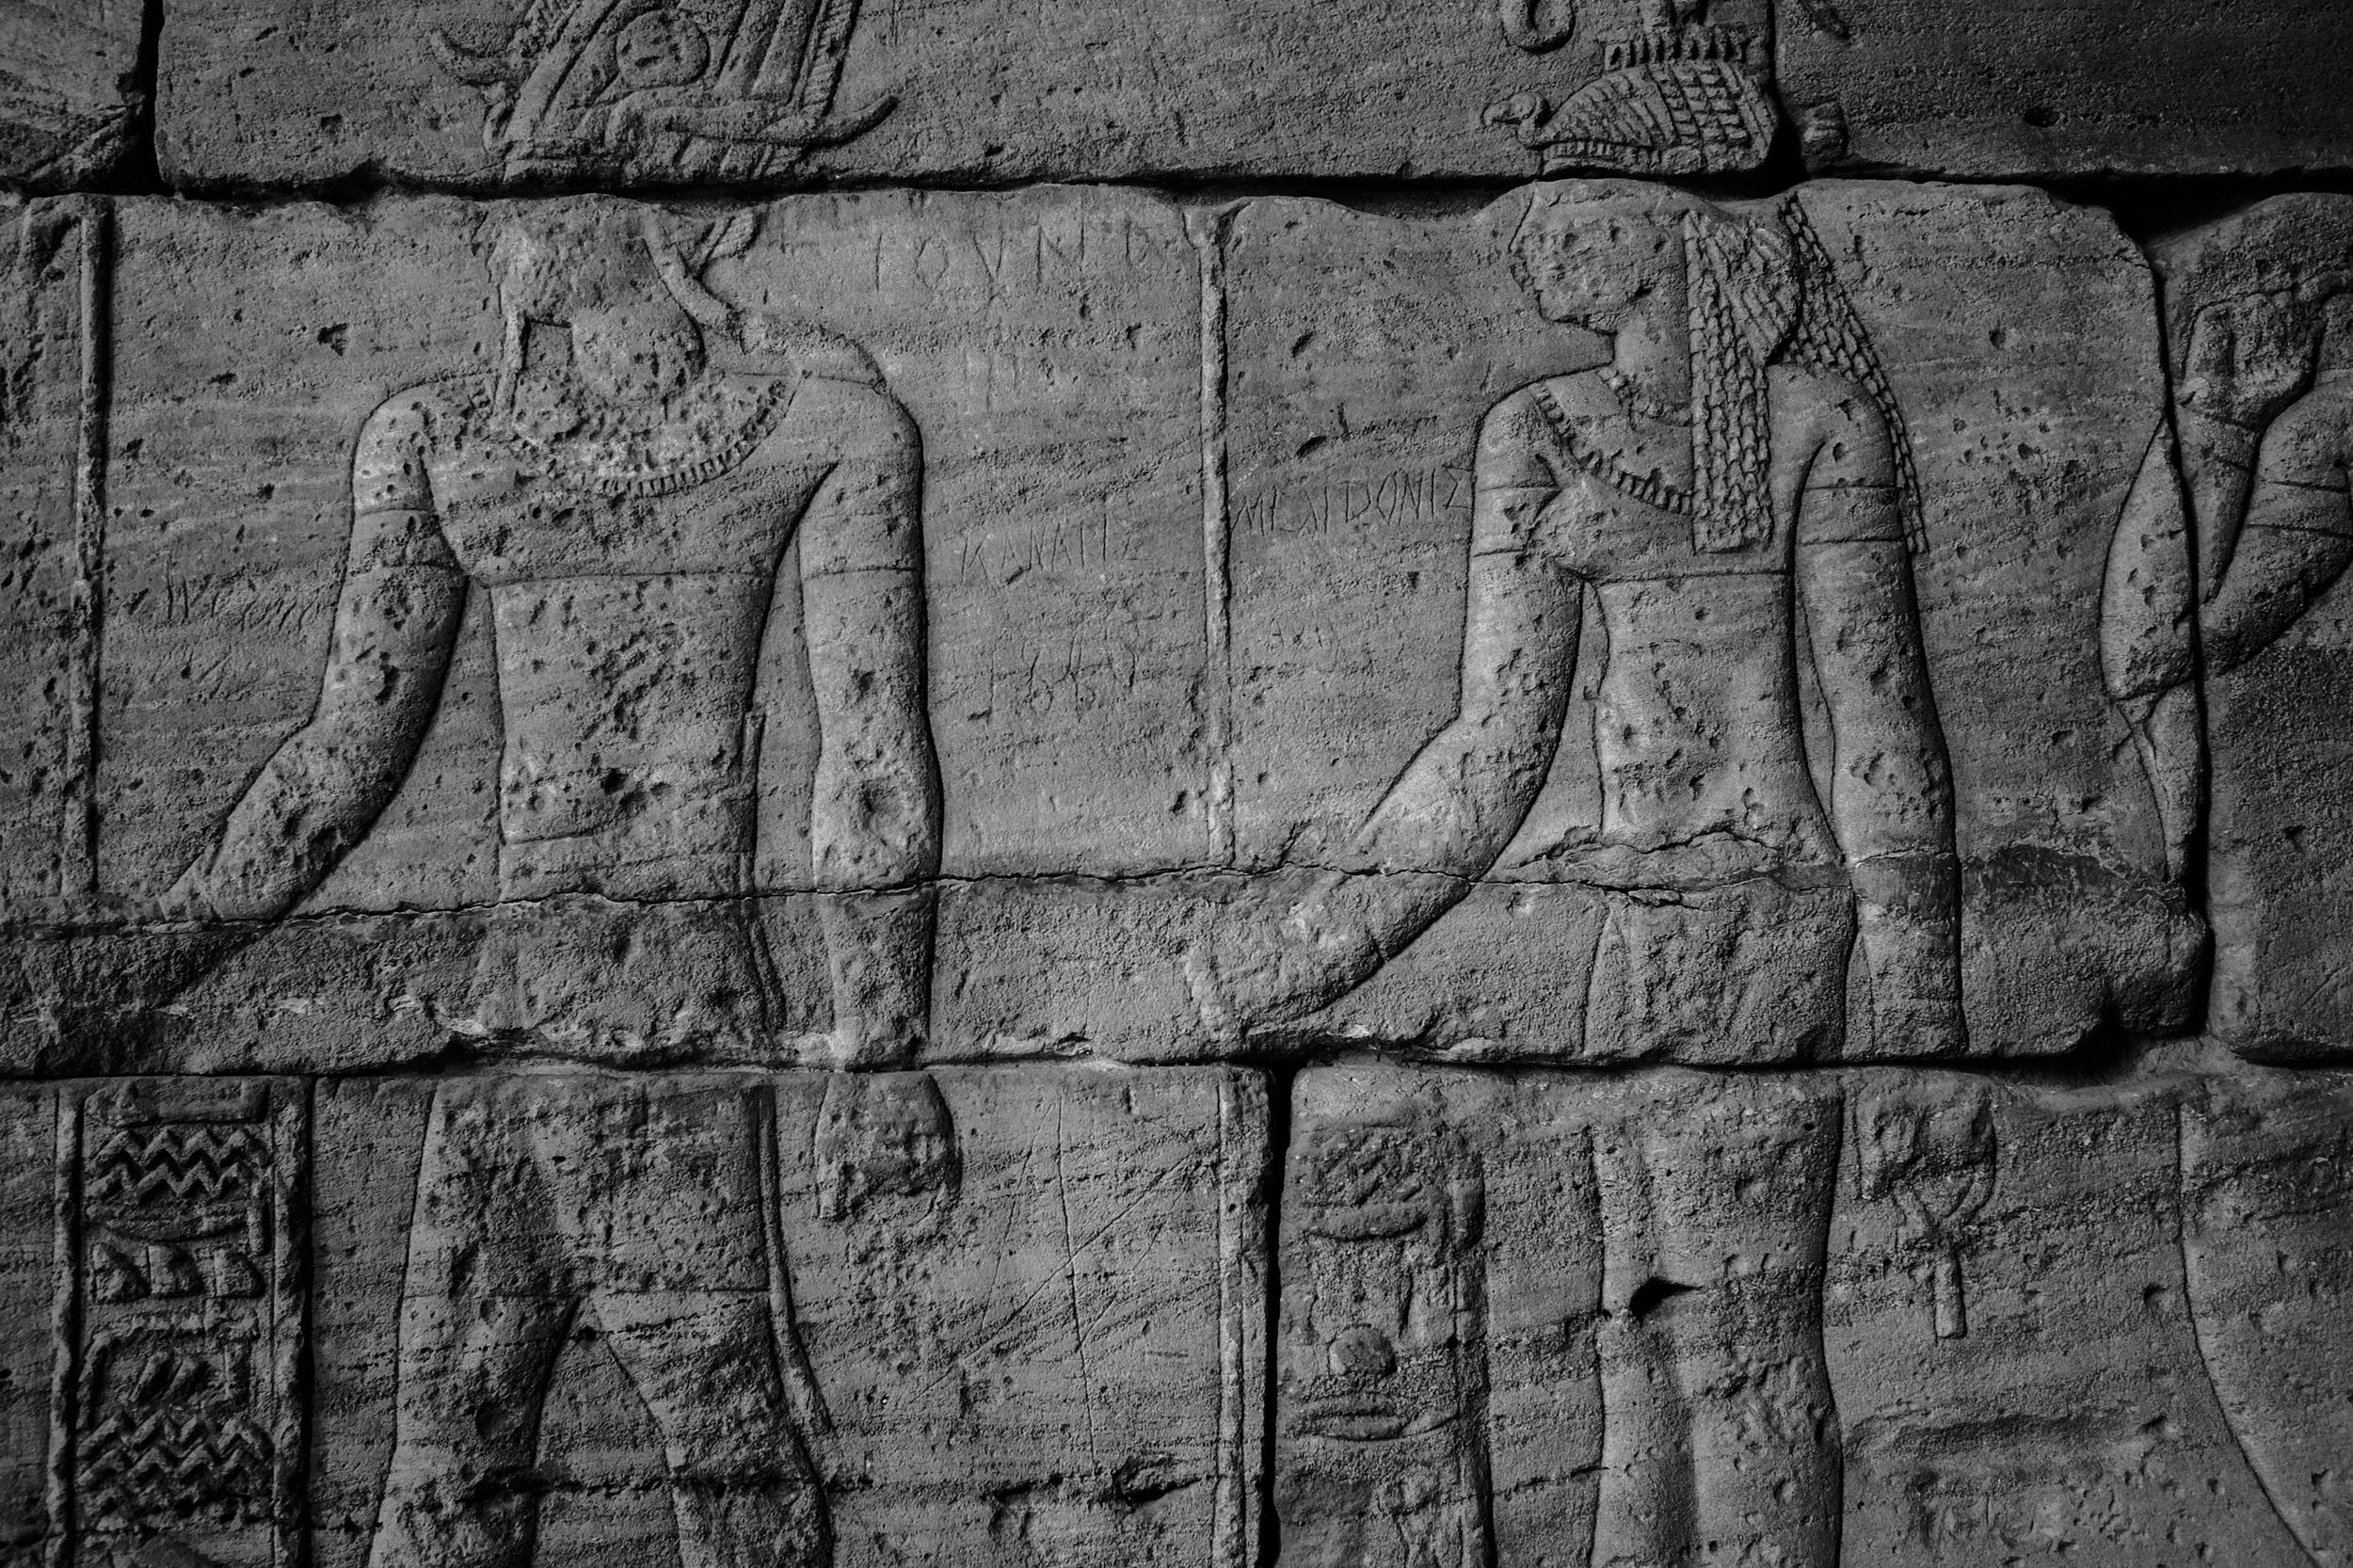 Heiroglyphs from the Temple of Dendur